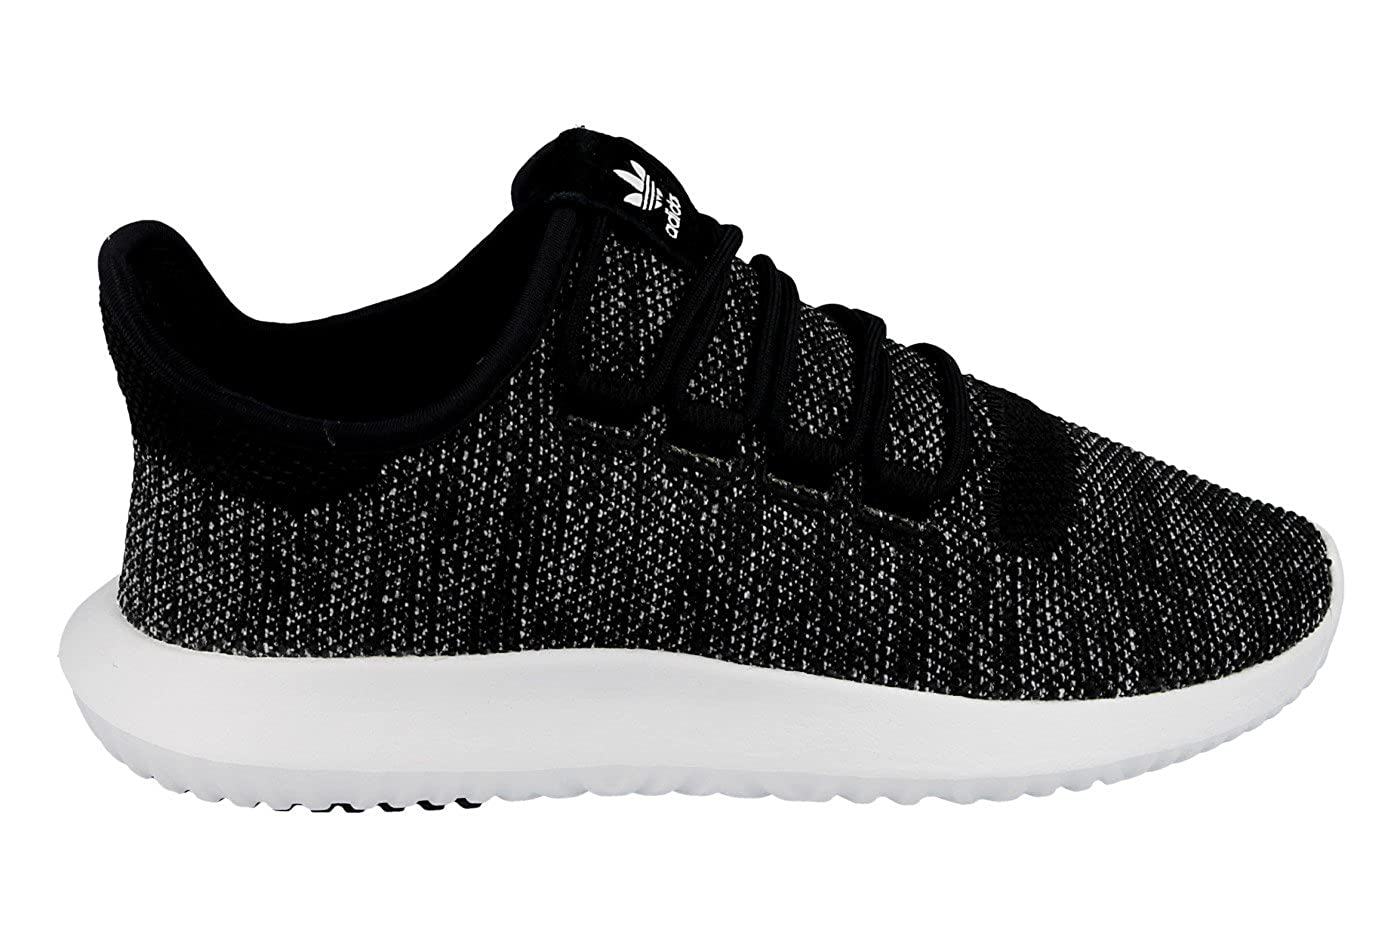 Adidas Originals Tubular Shadow Knit J Junior